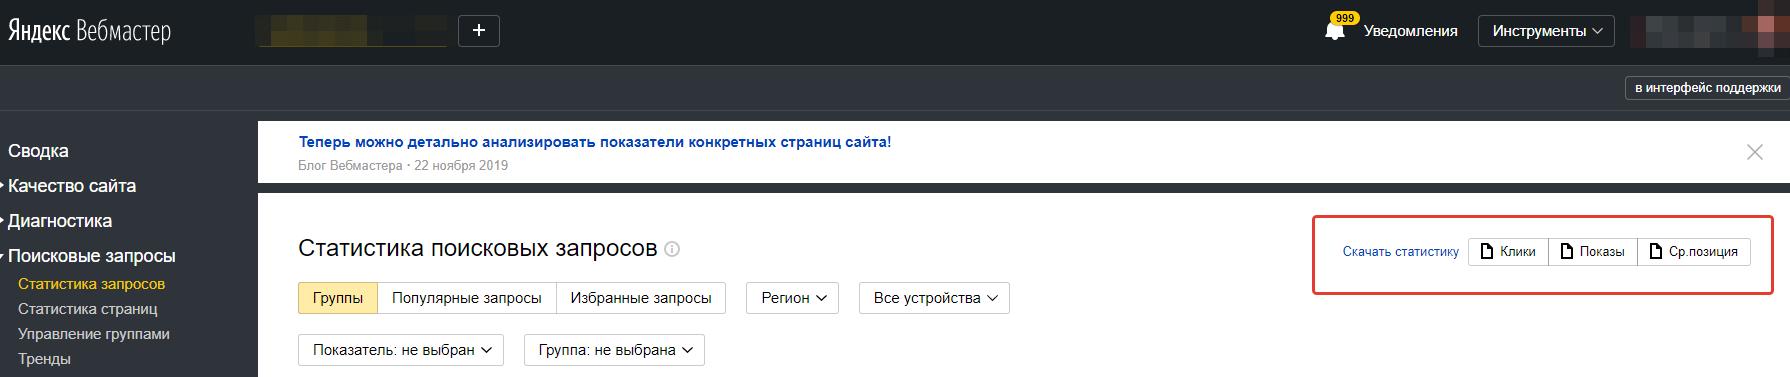 Статистика запросов в Яндекс Вебмастере